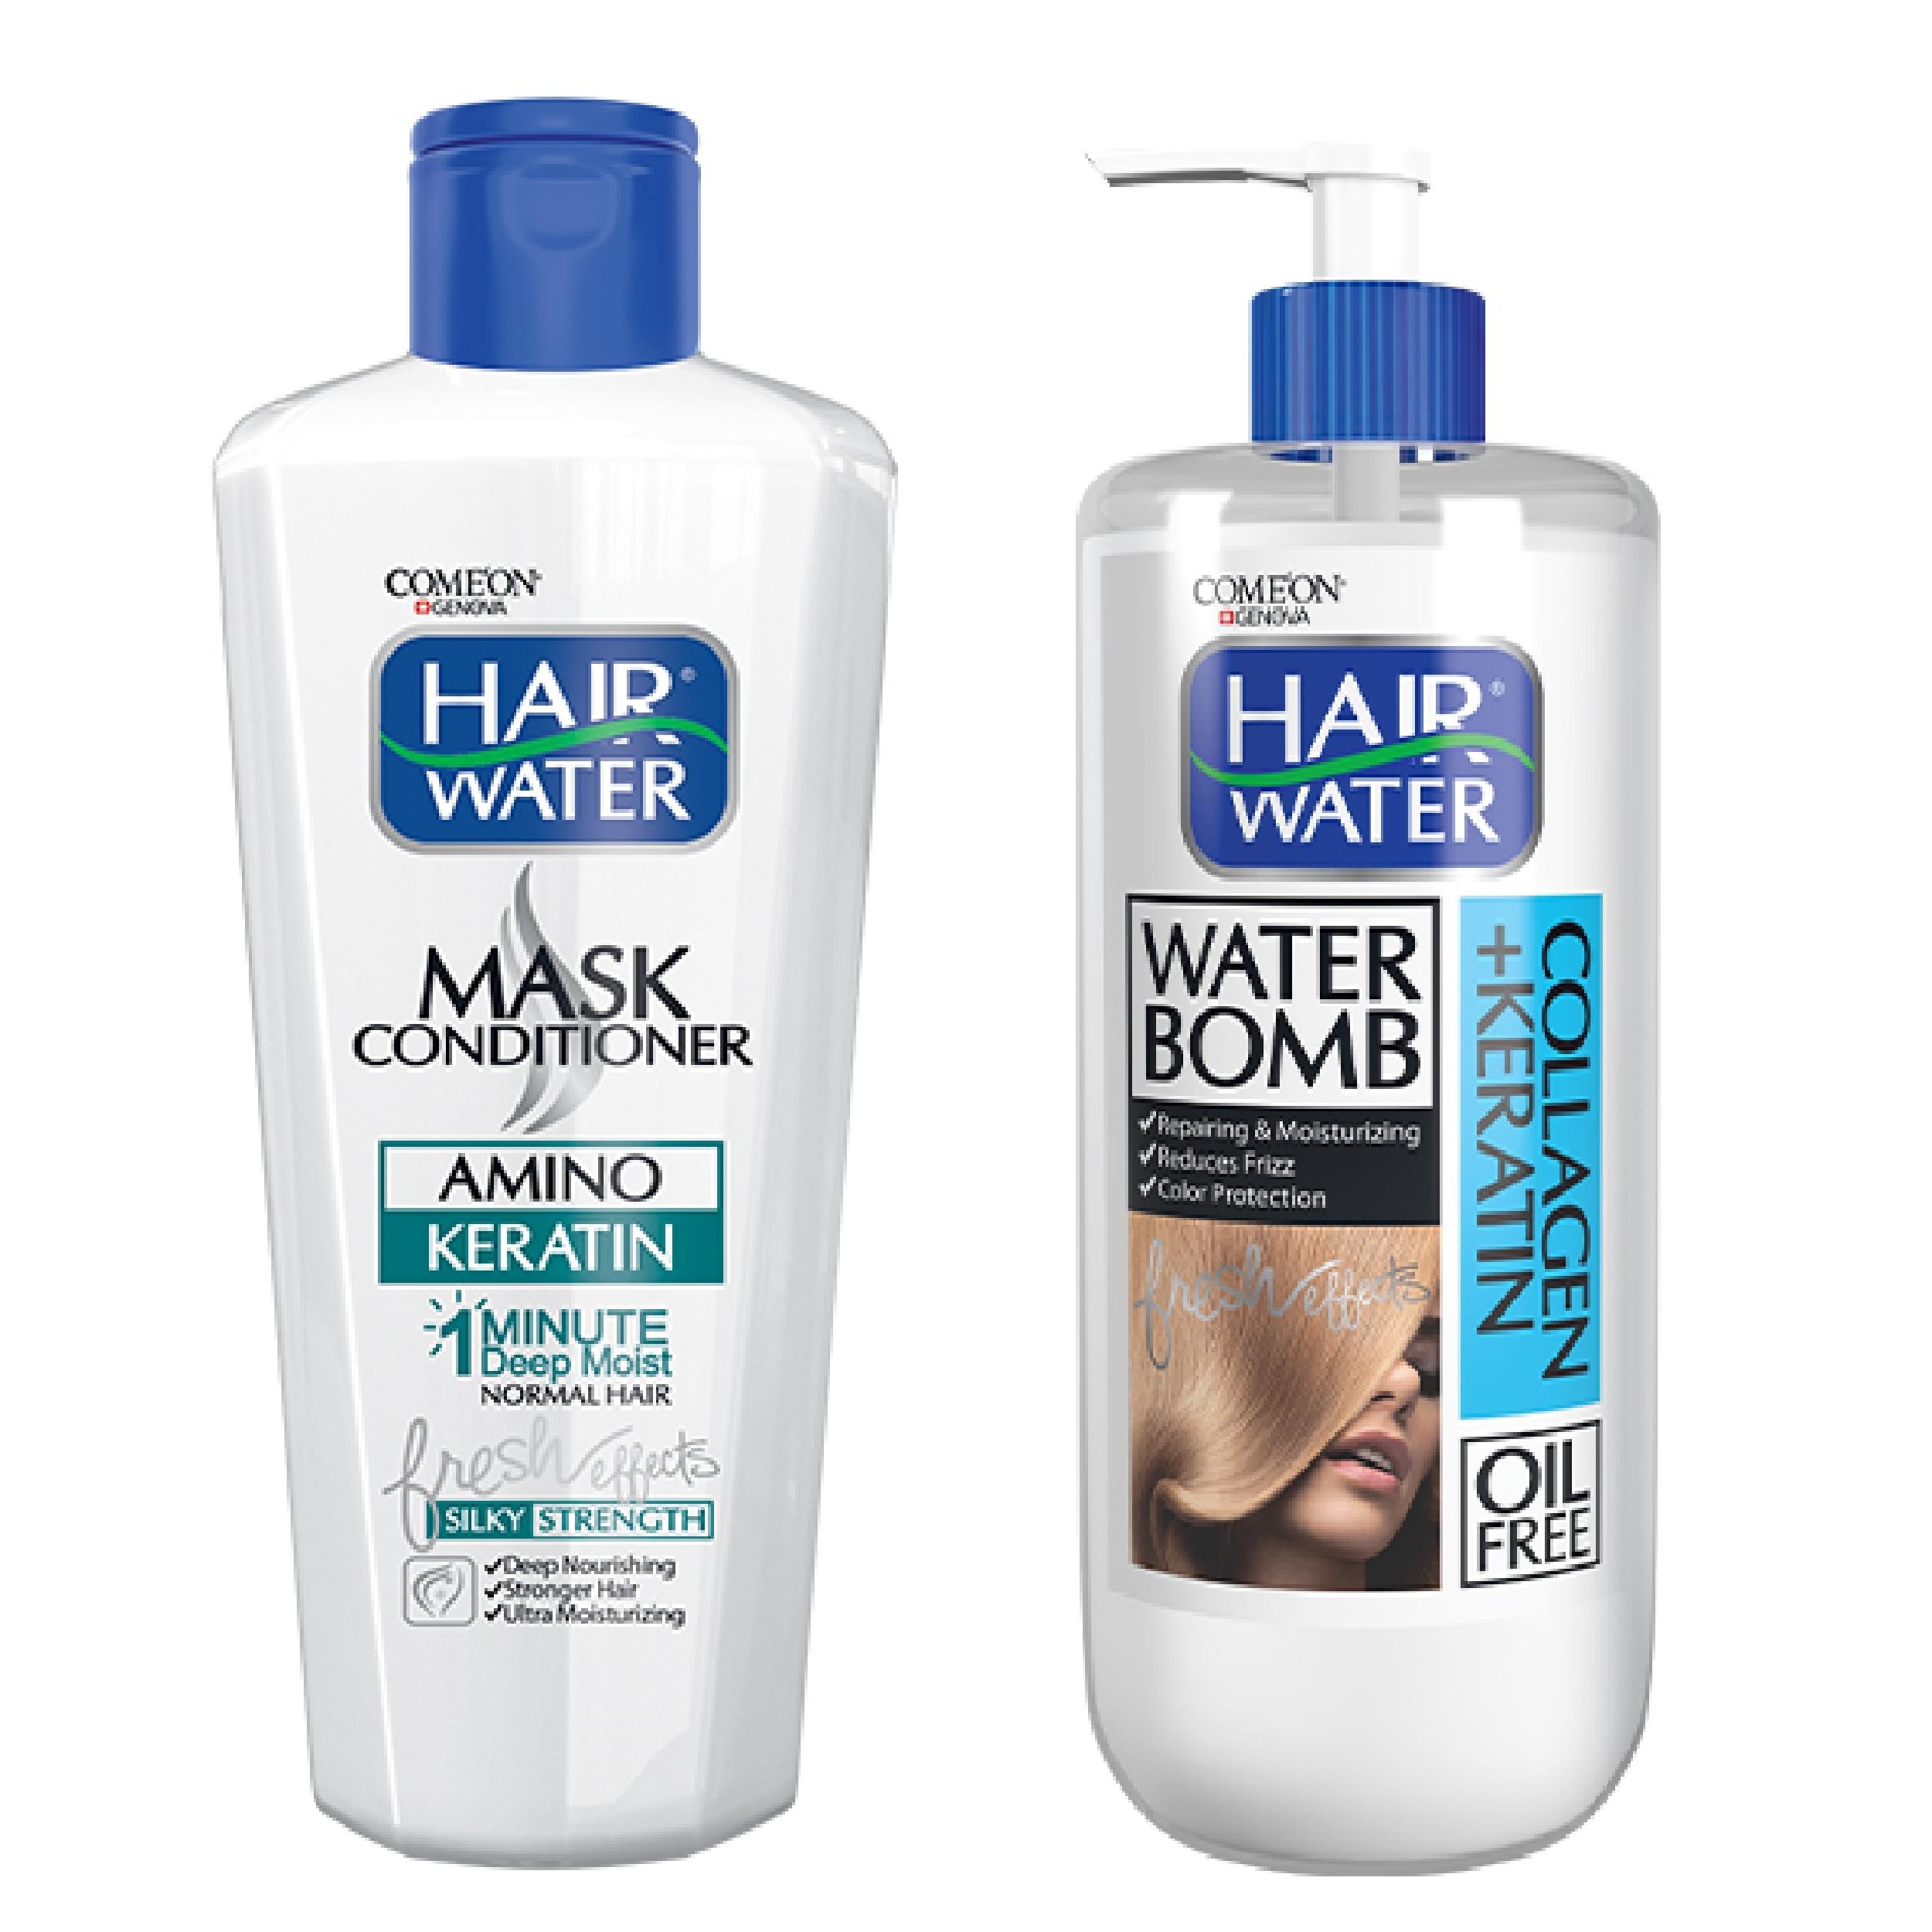 ماسک مو کامان مدل Amino Keratin به همراه کرم آبرسان مو کامان مدل Collagen + Keratin Water Bomb